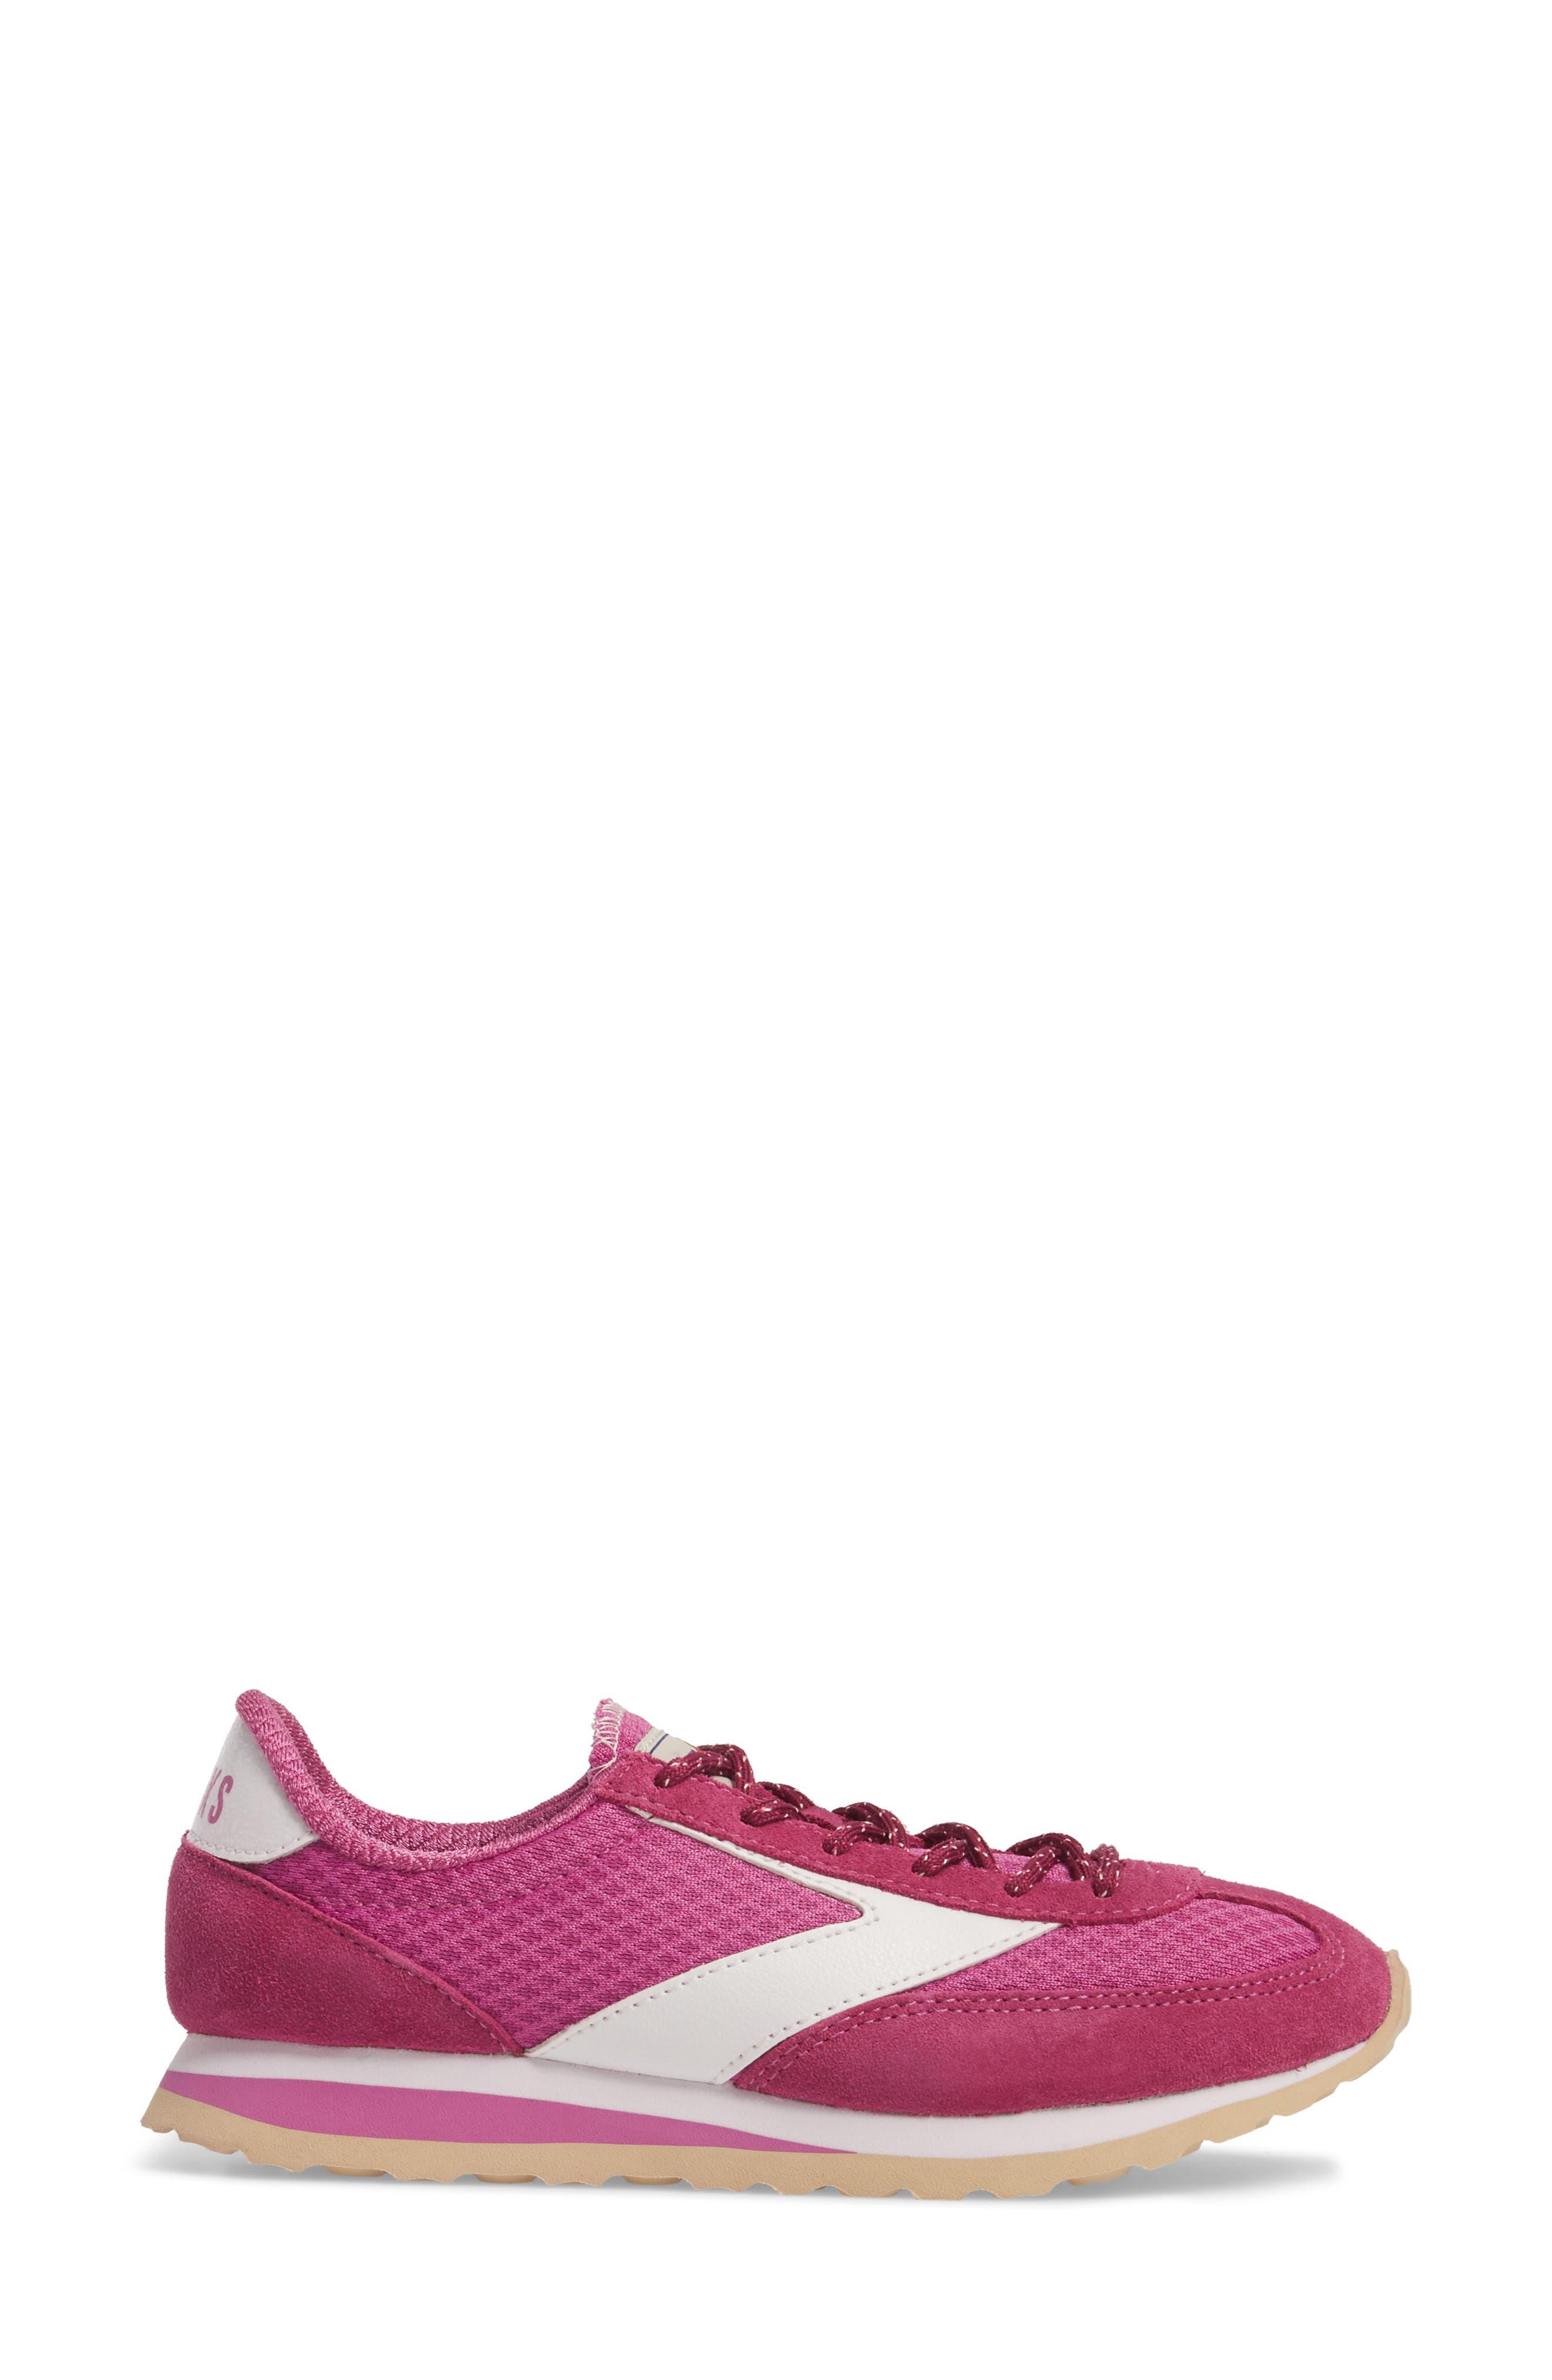 Alternate Image 3  - Brooks 'Vanguard' Sneaker (Women)